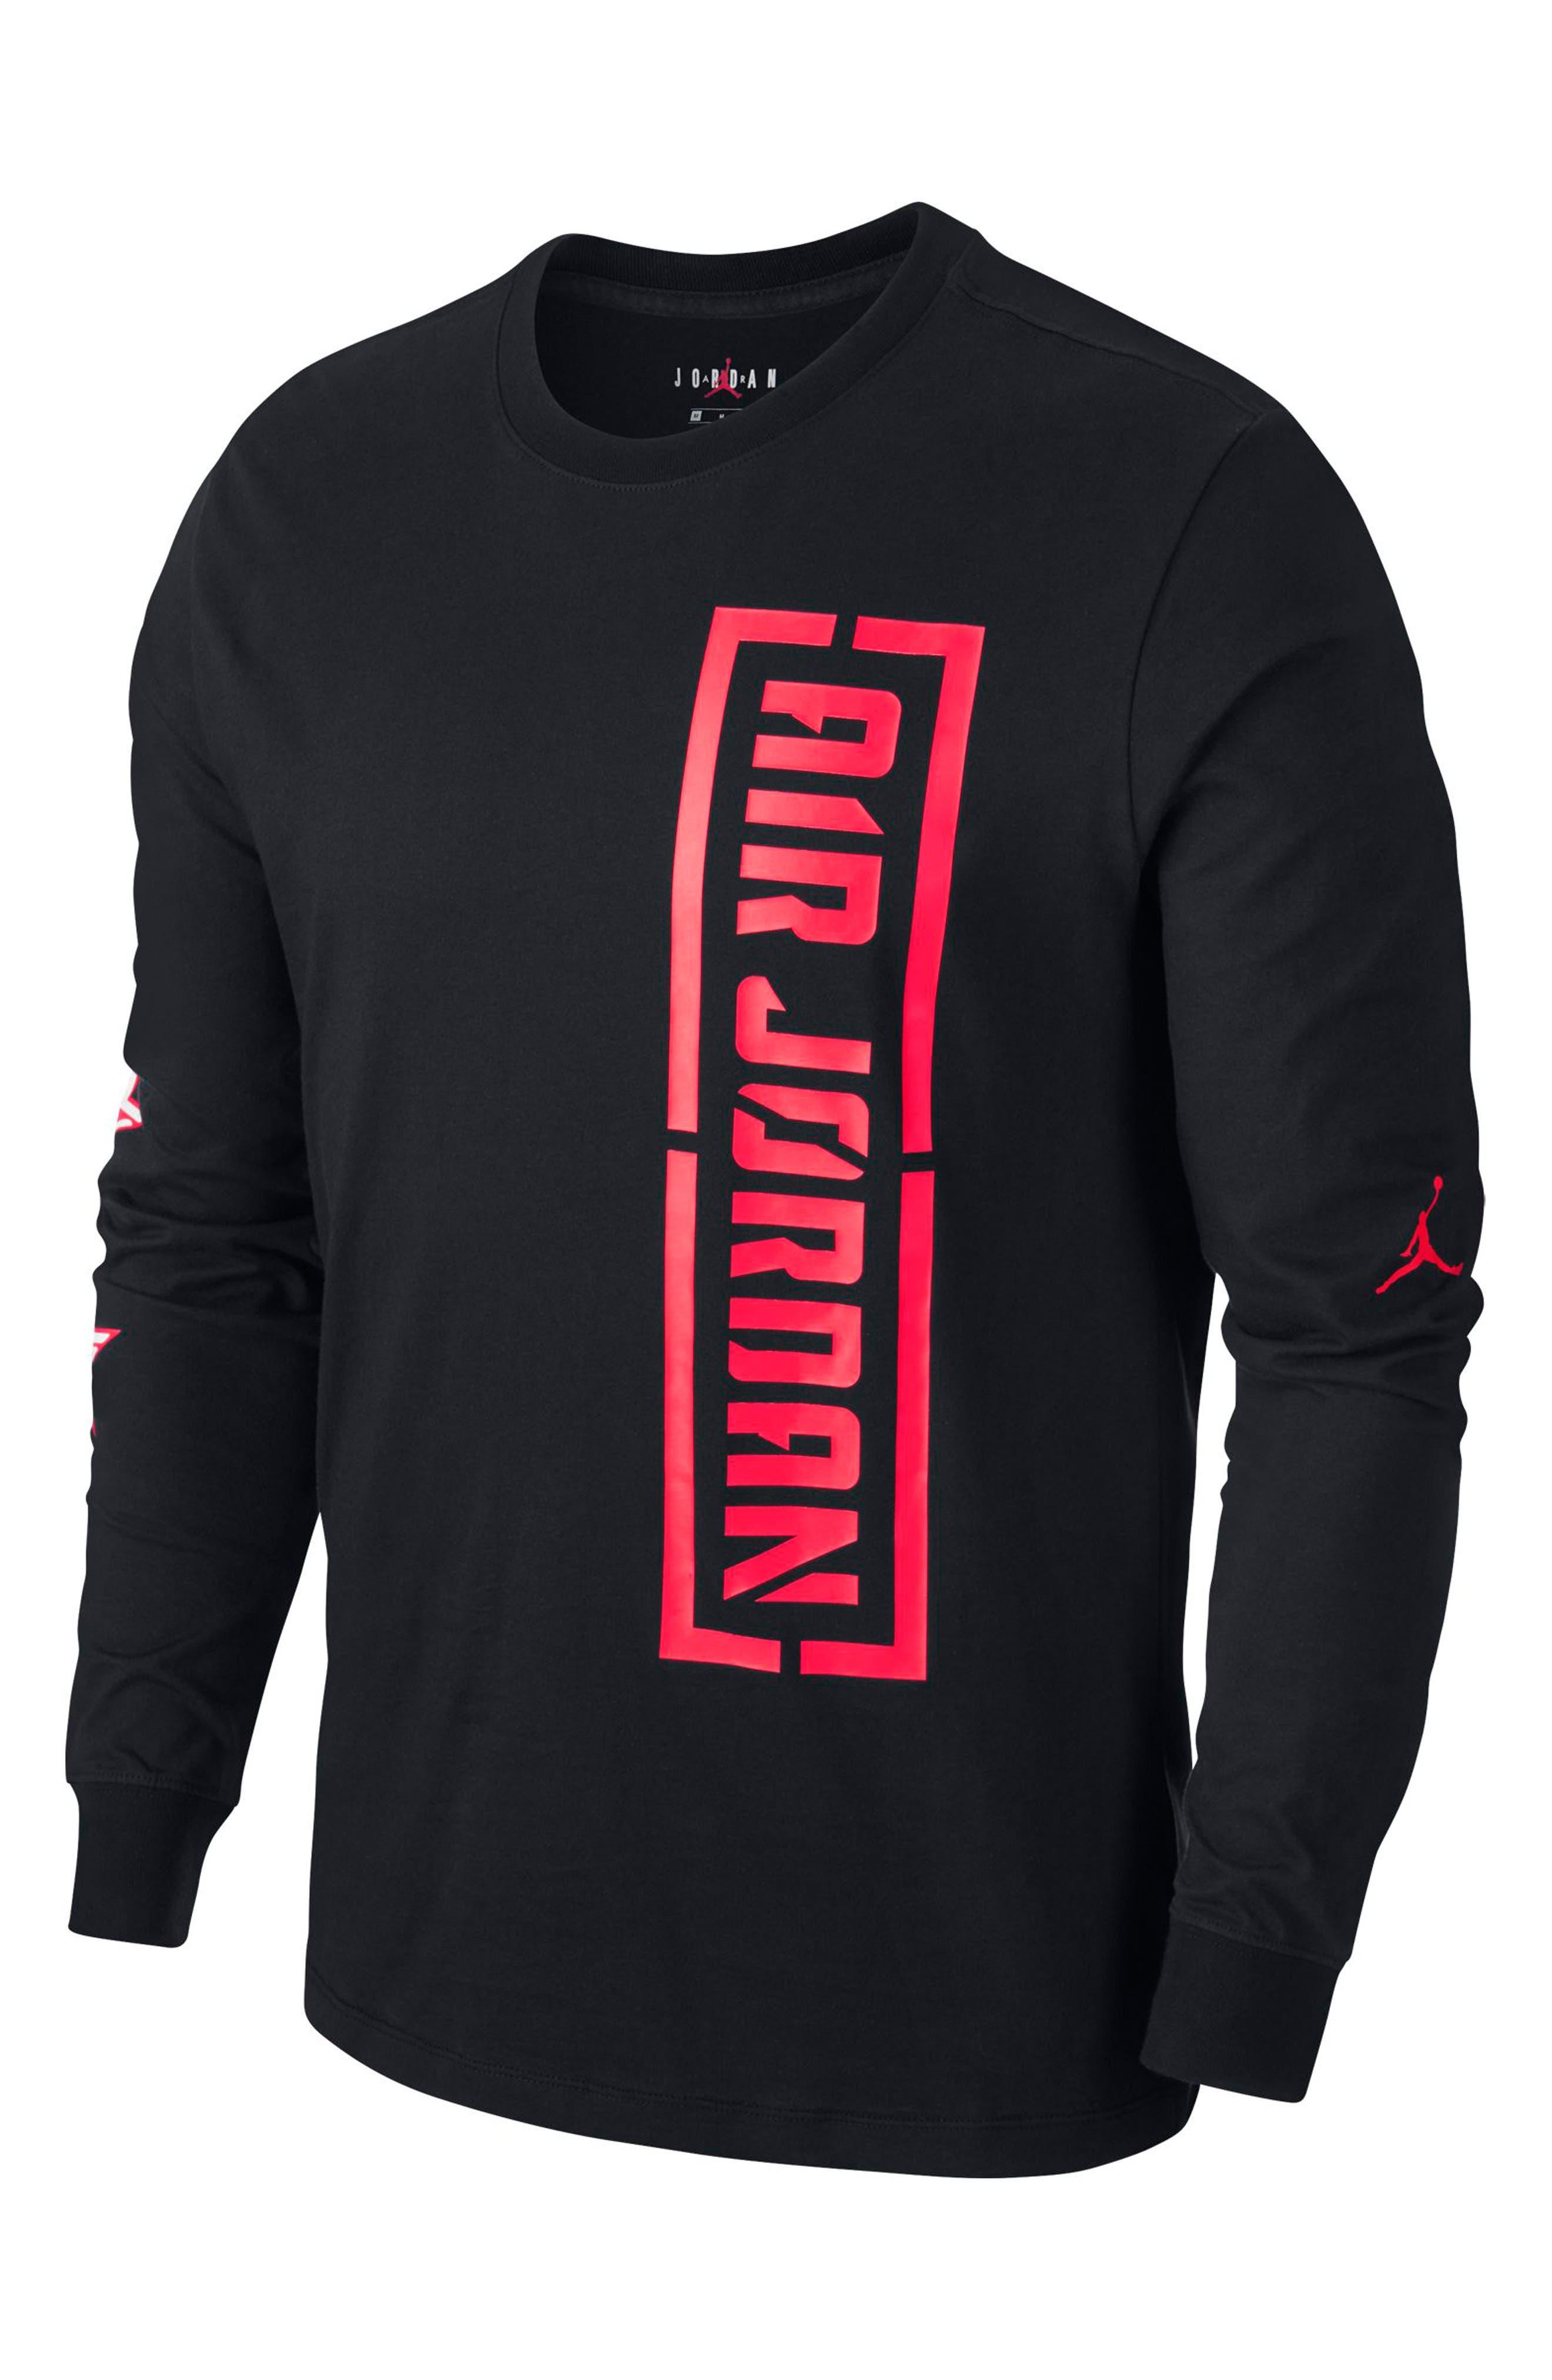 JORDAN, JSW Long Sleeve T-Shirt, Alternate thumbnail 3, color, BLACK/ INFRARED 23